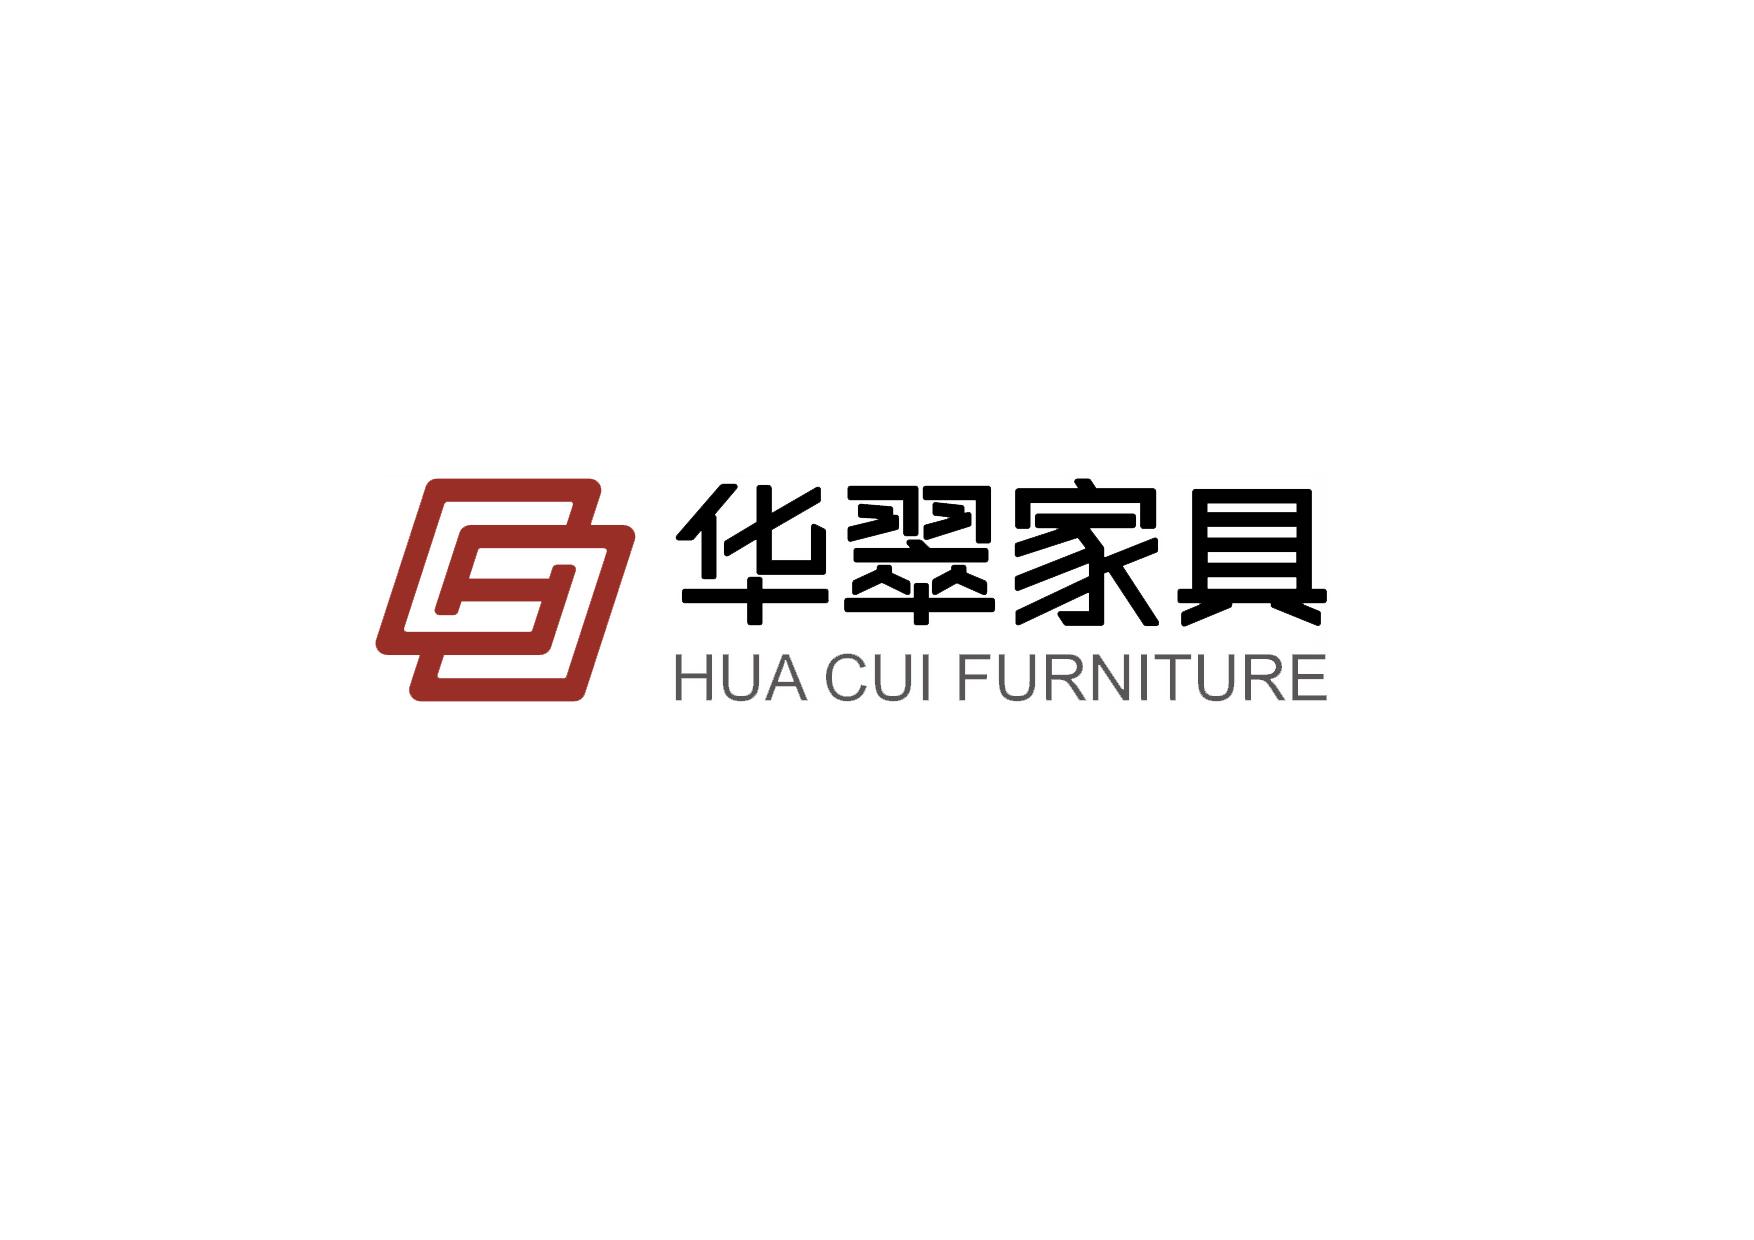 乐虎国际官网网站logo.png